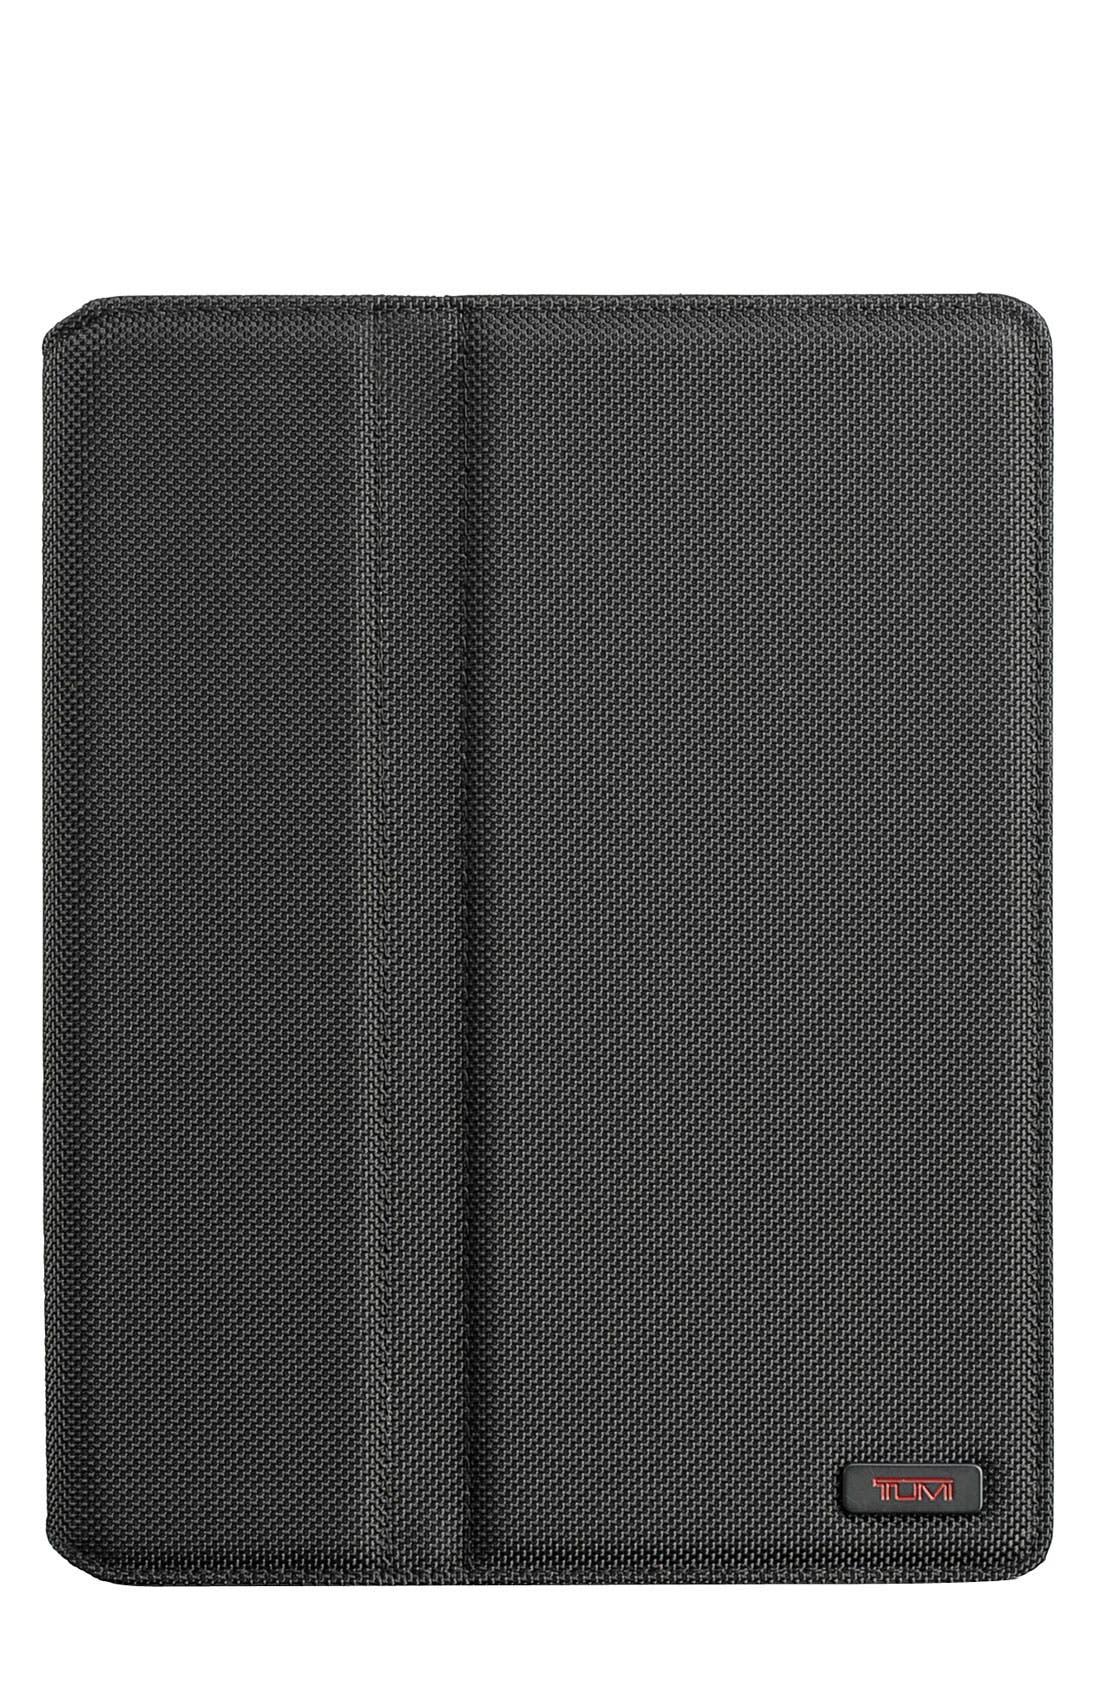 Ballistic Nylon iPad 2 Cover,                         Main,                         color,